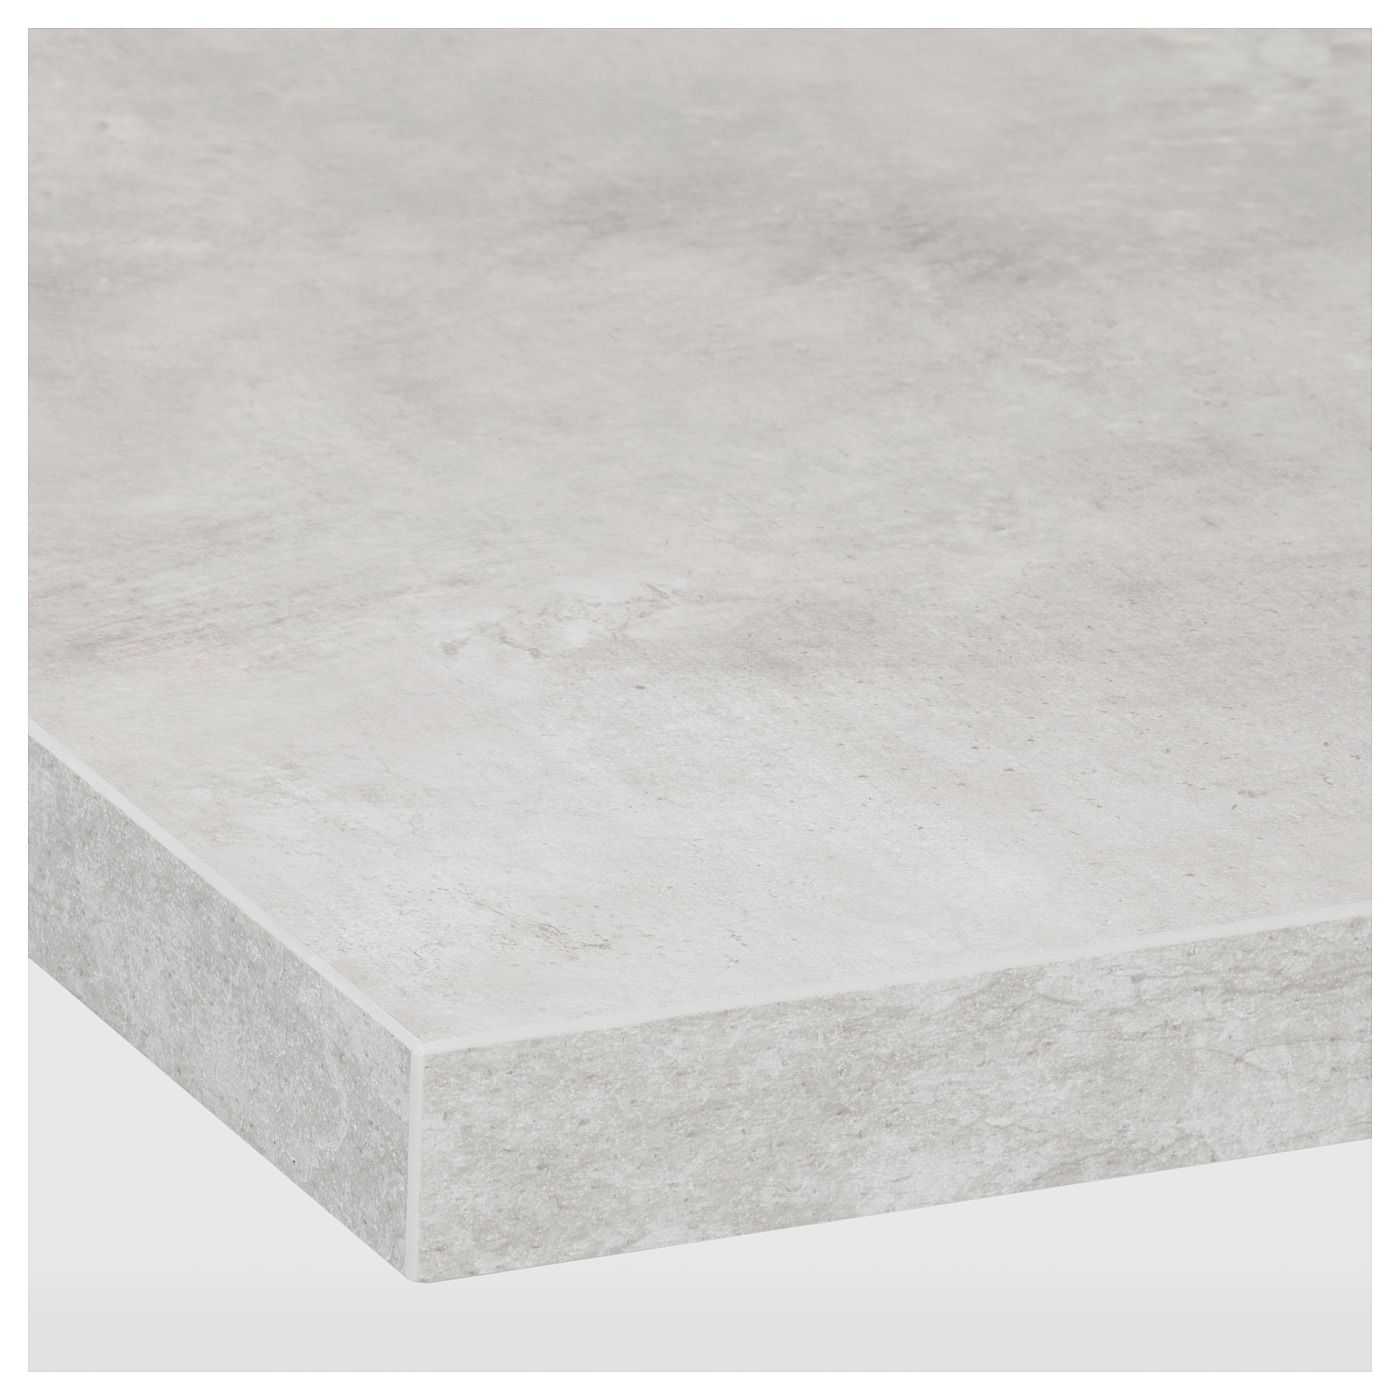 Ekbacken Bankskiva Ljusgra Betongmonstrad Laminat 186x2 8 Cm Ikea Laminate Countertops Countertops Kitchen Countertops